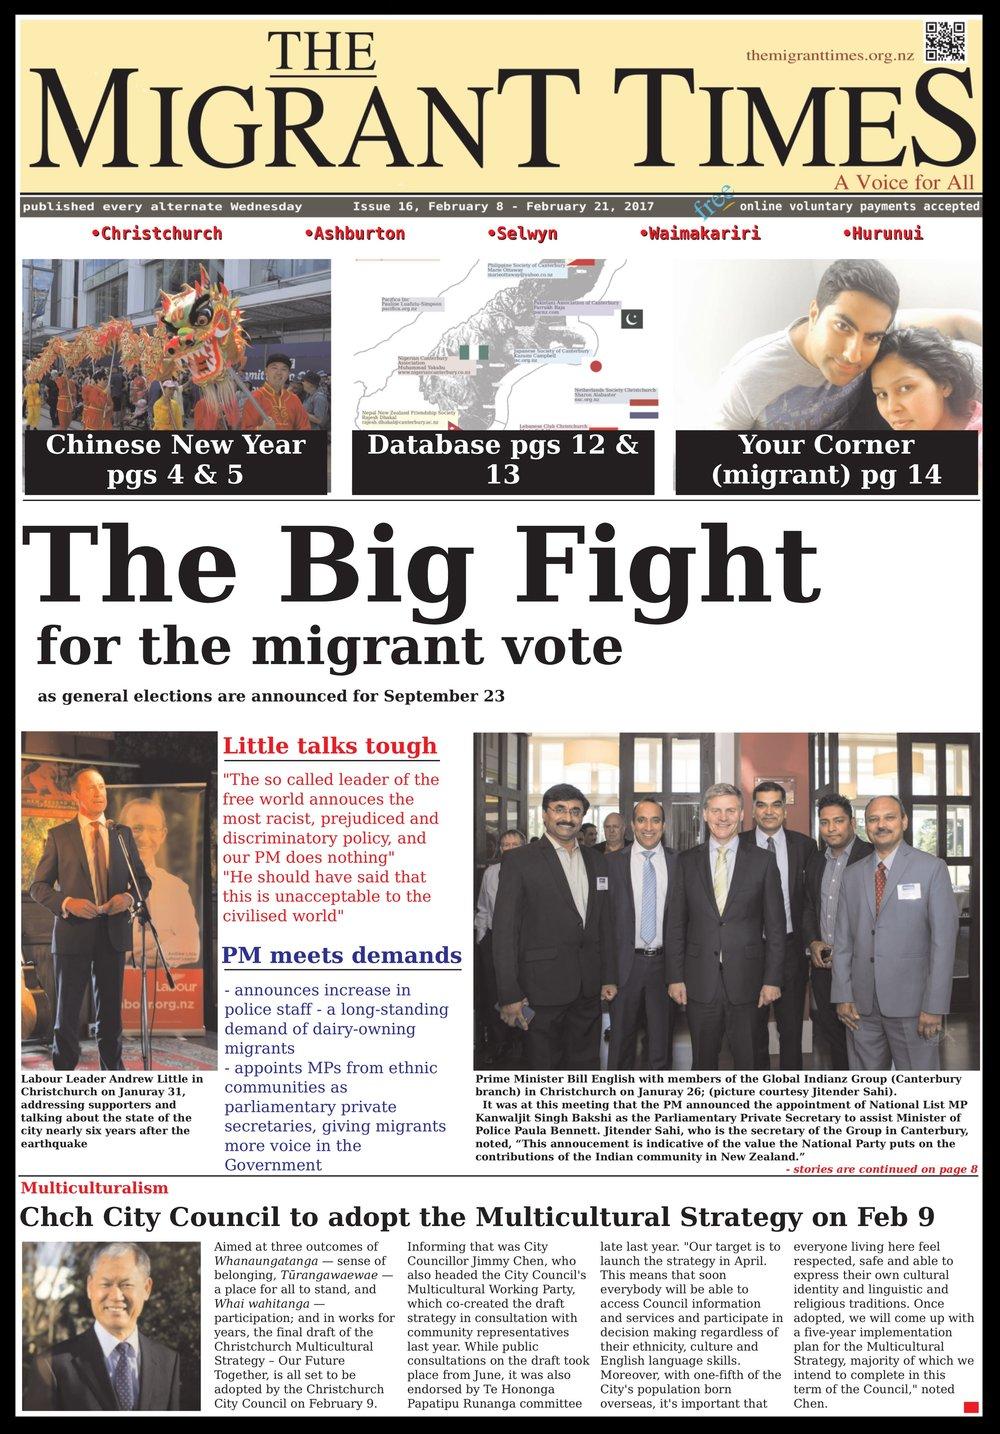 Issue 16, February 8 - February 21, 2017